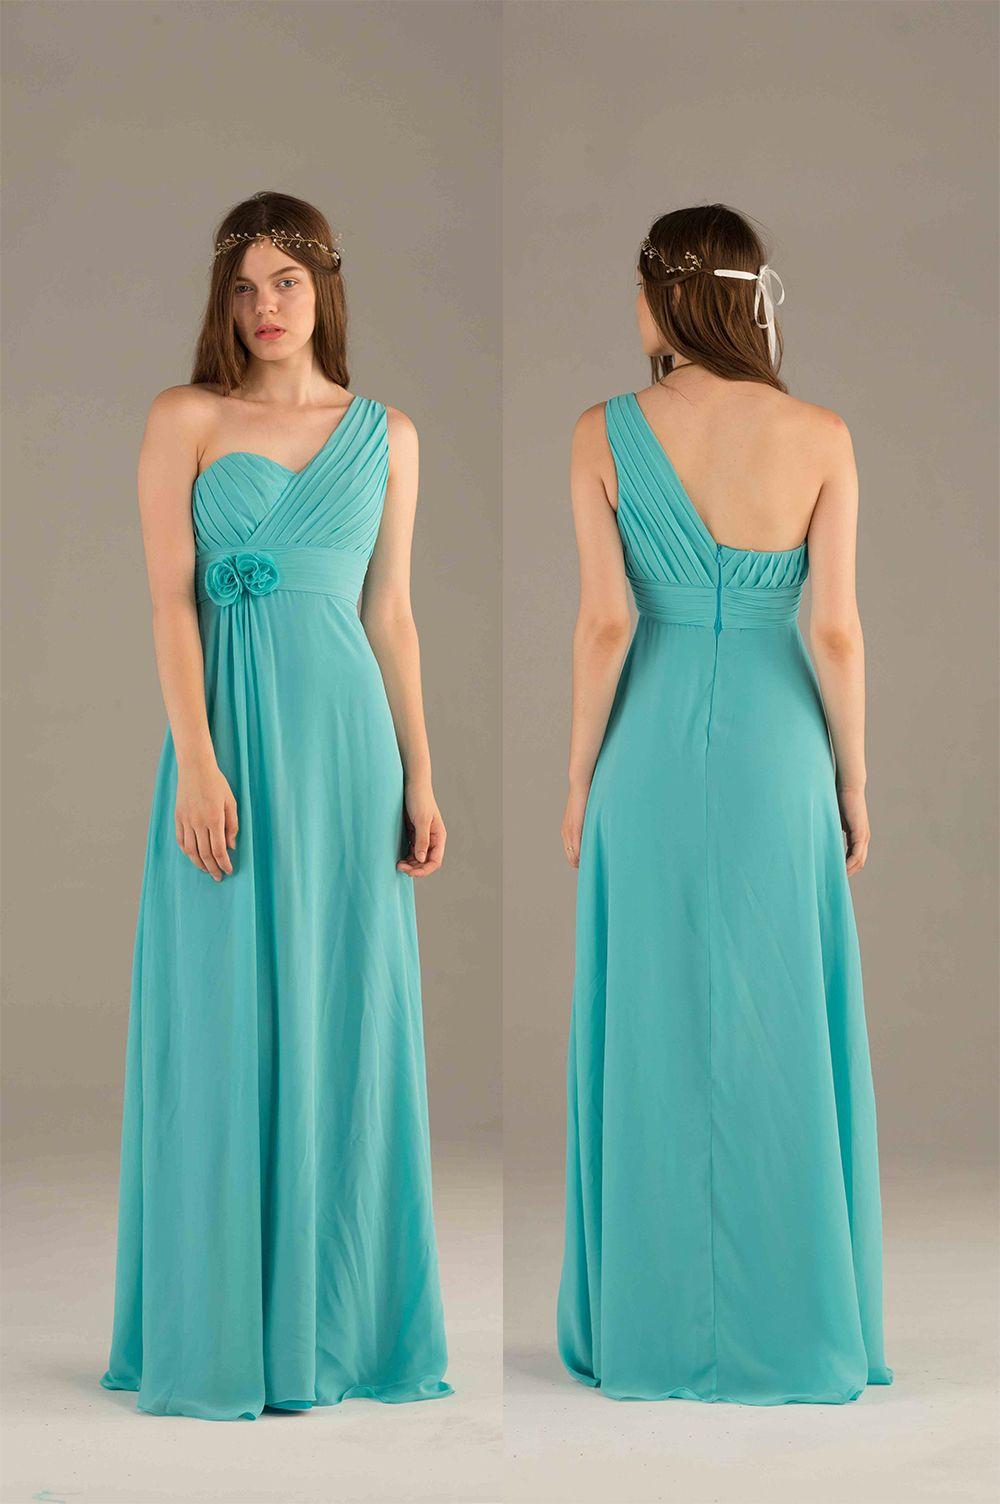 Turquoise bridesmaid dress long chiffon prom dress blue one